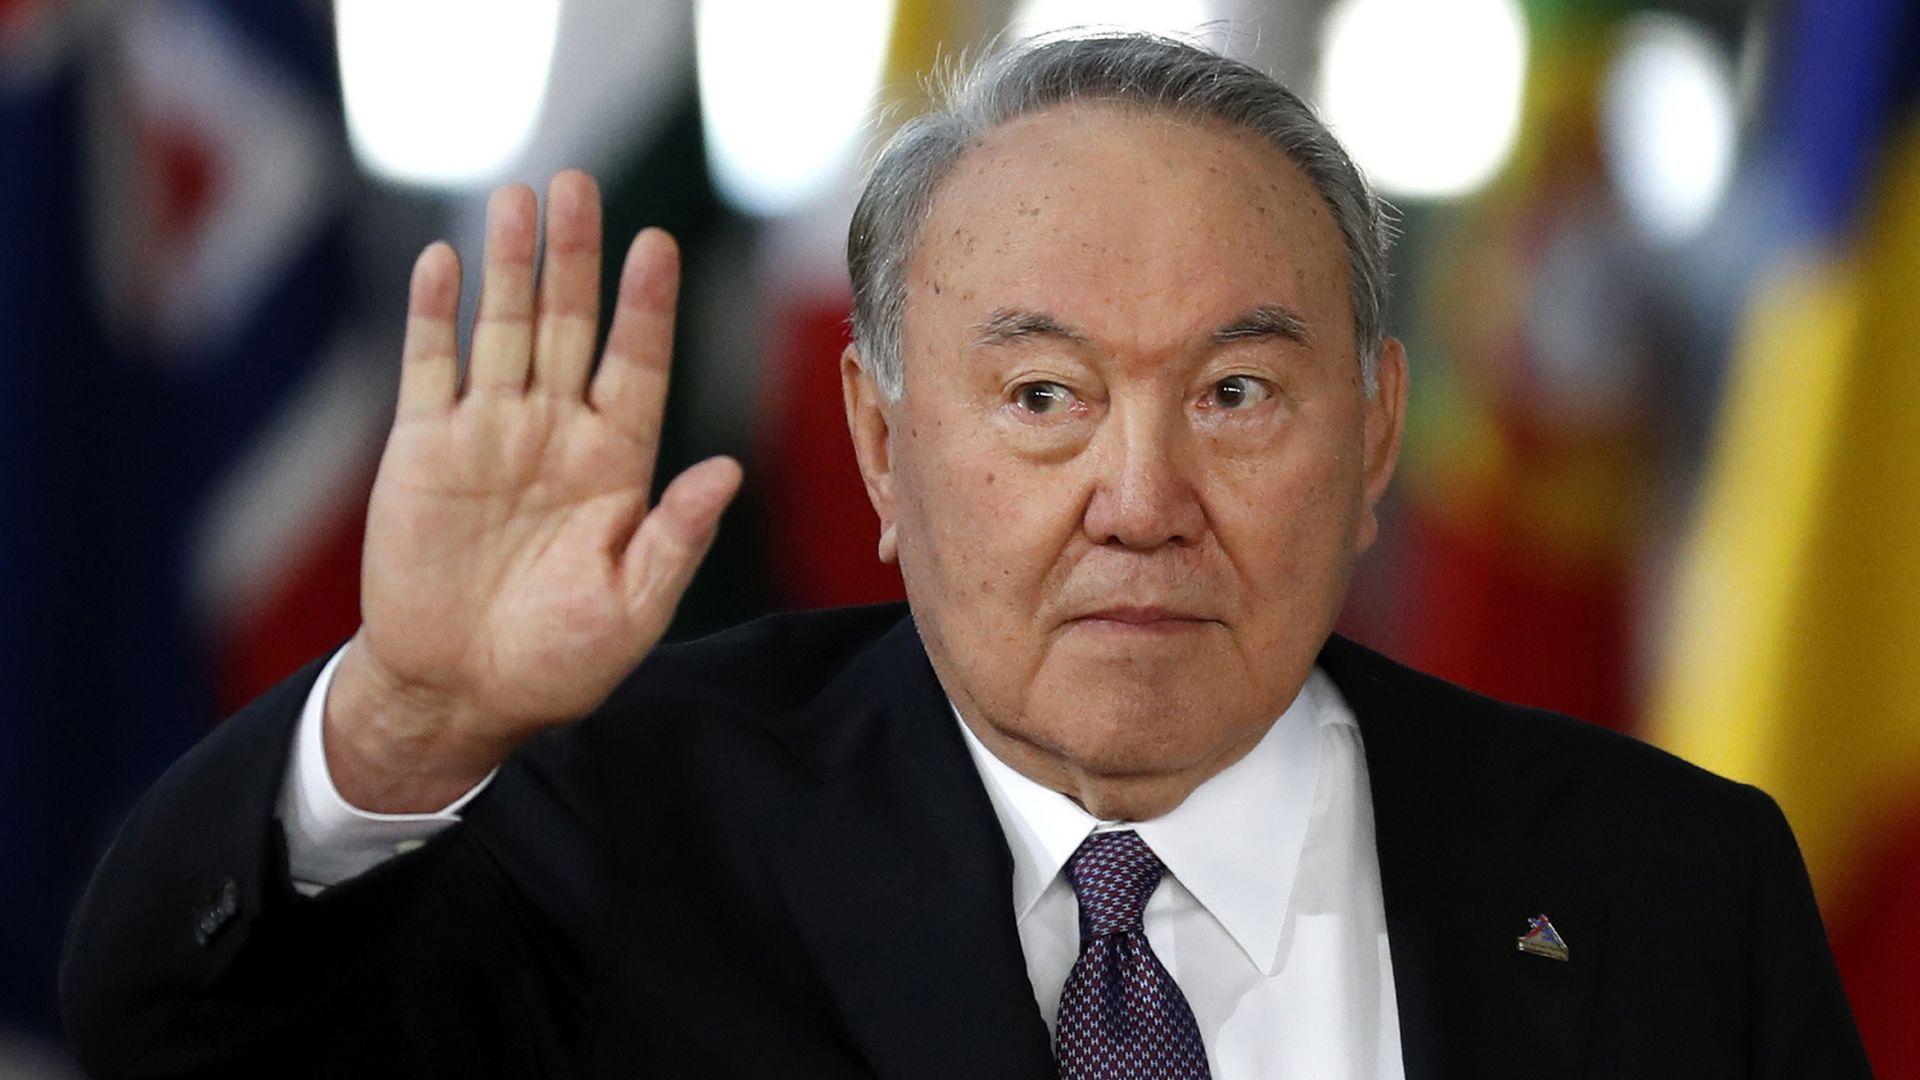 Касим-Жомарт Токаев положи клетва и прие днес поста и.д. президент